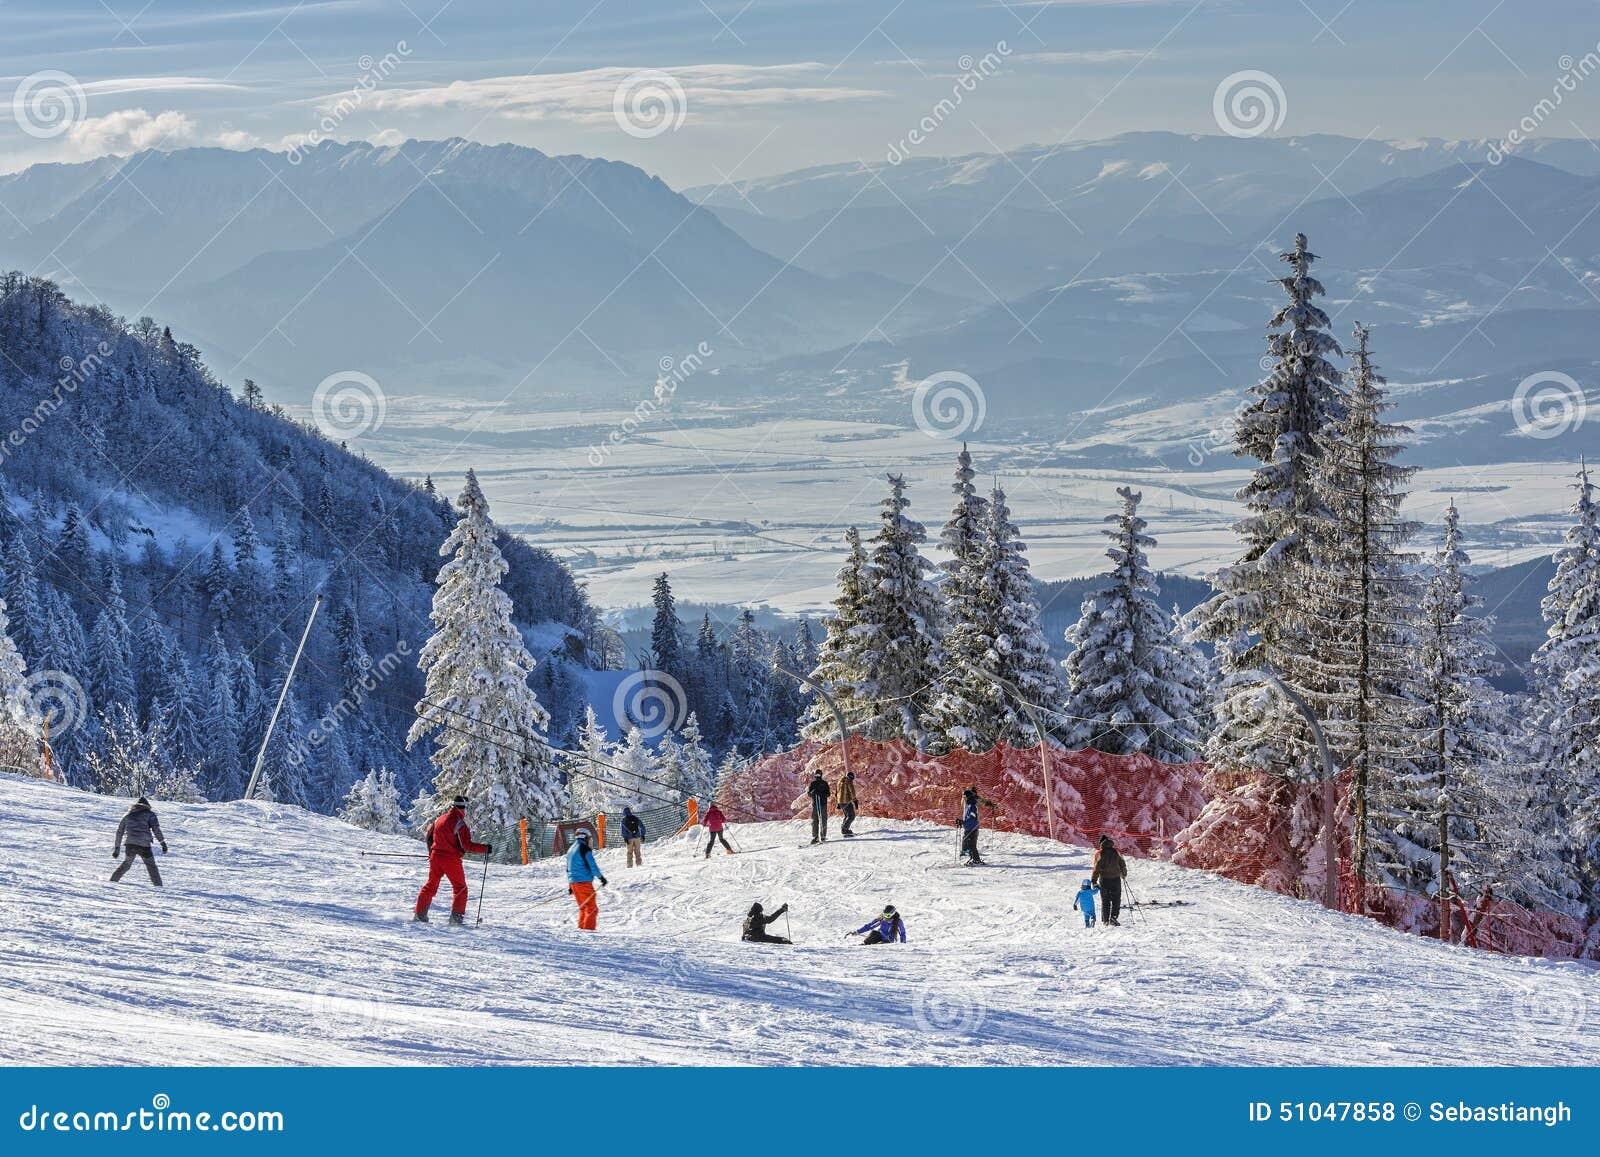 skiers on slope editorial stock photo. image of romania - 51047858